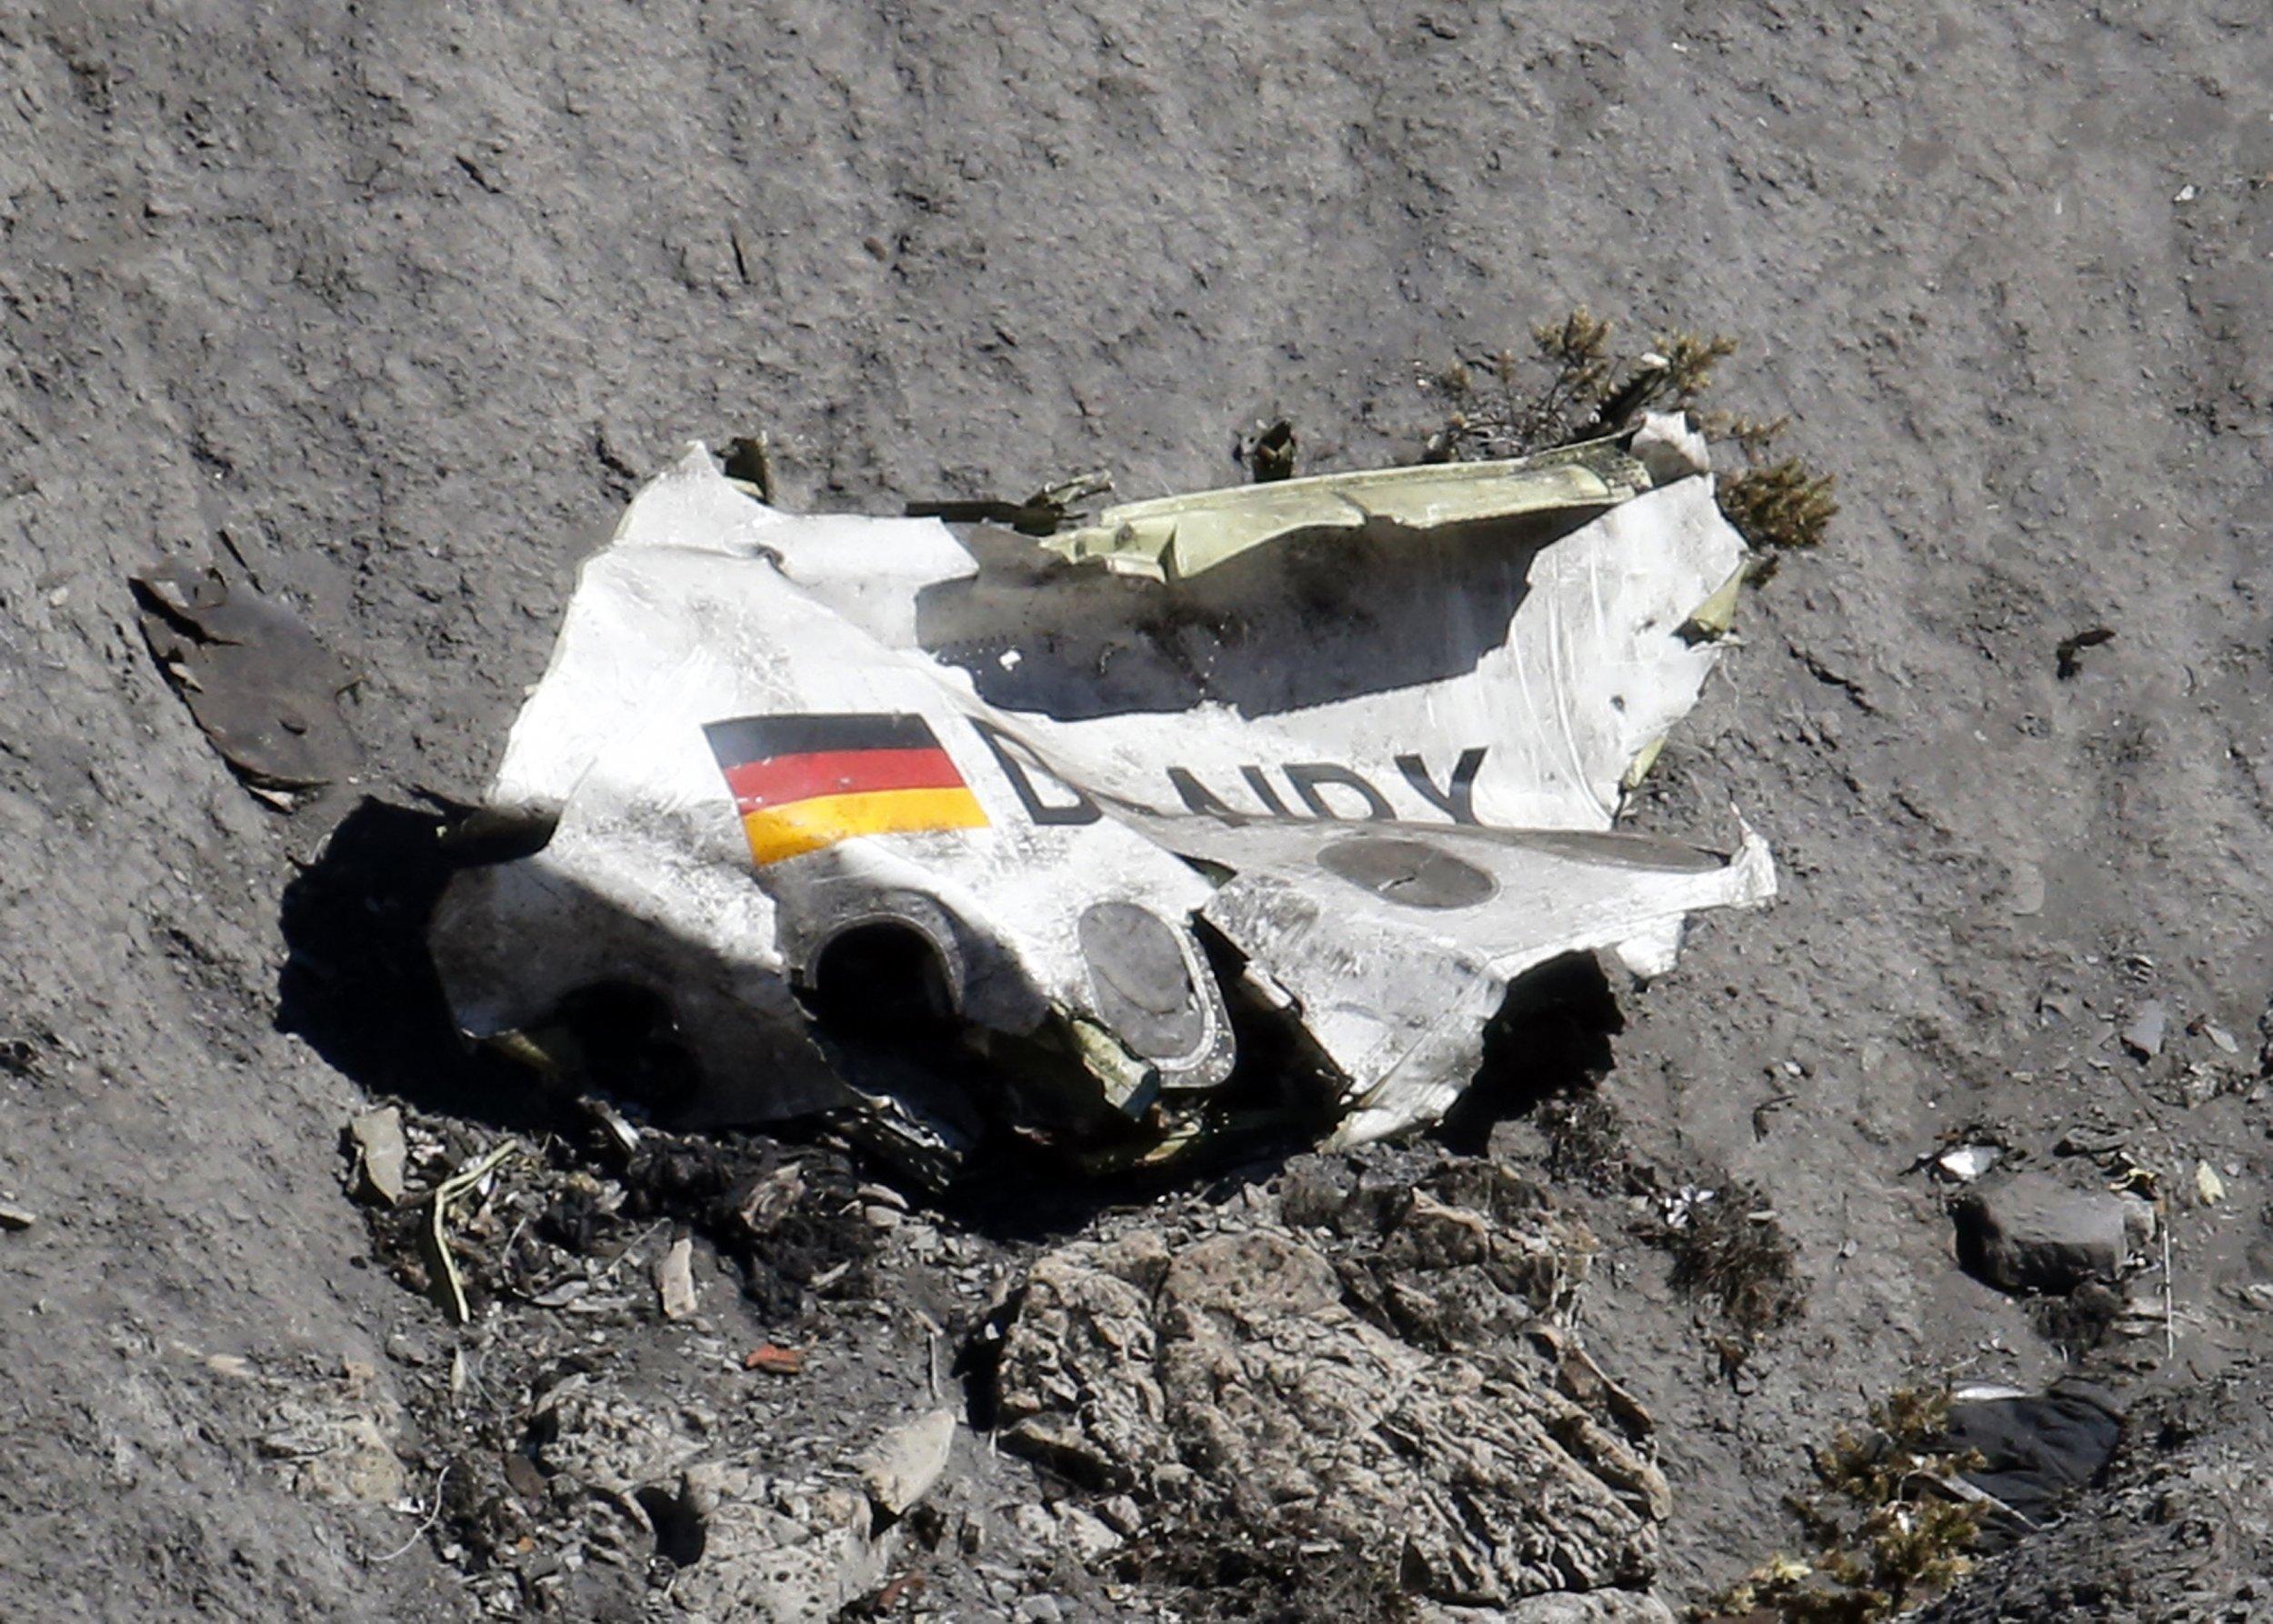 Wreckage of the Germanwings Airbus A320